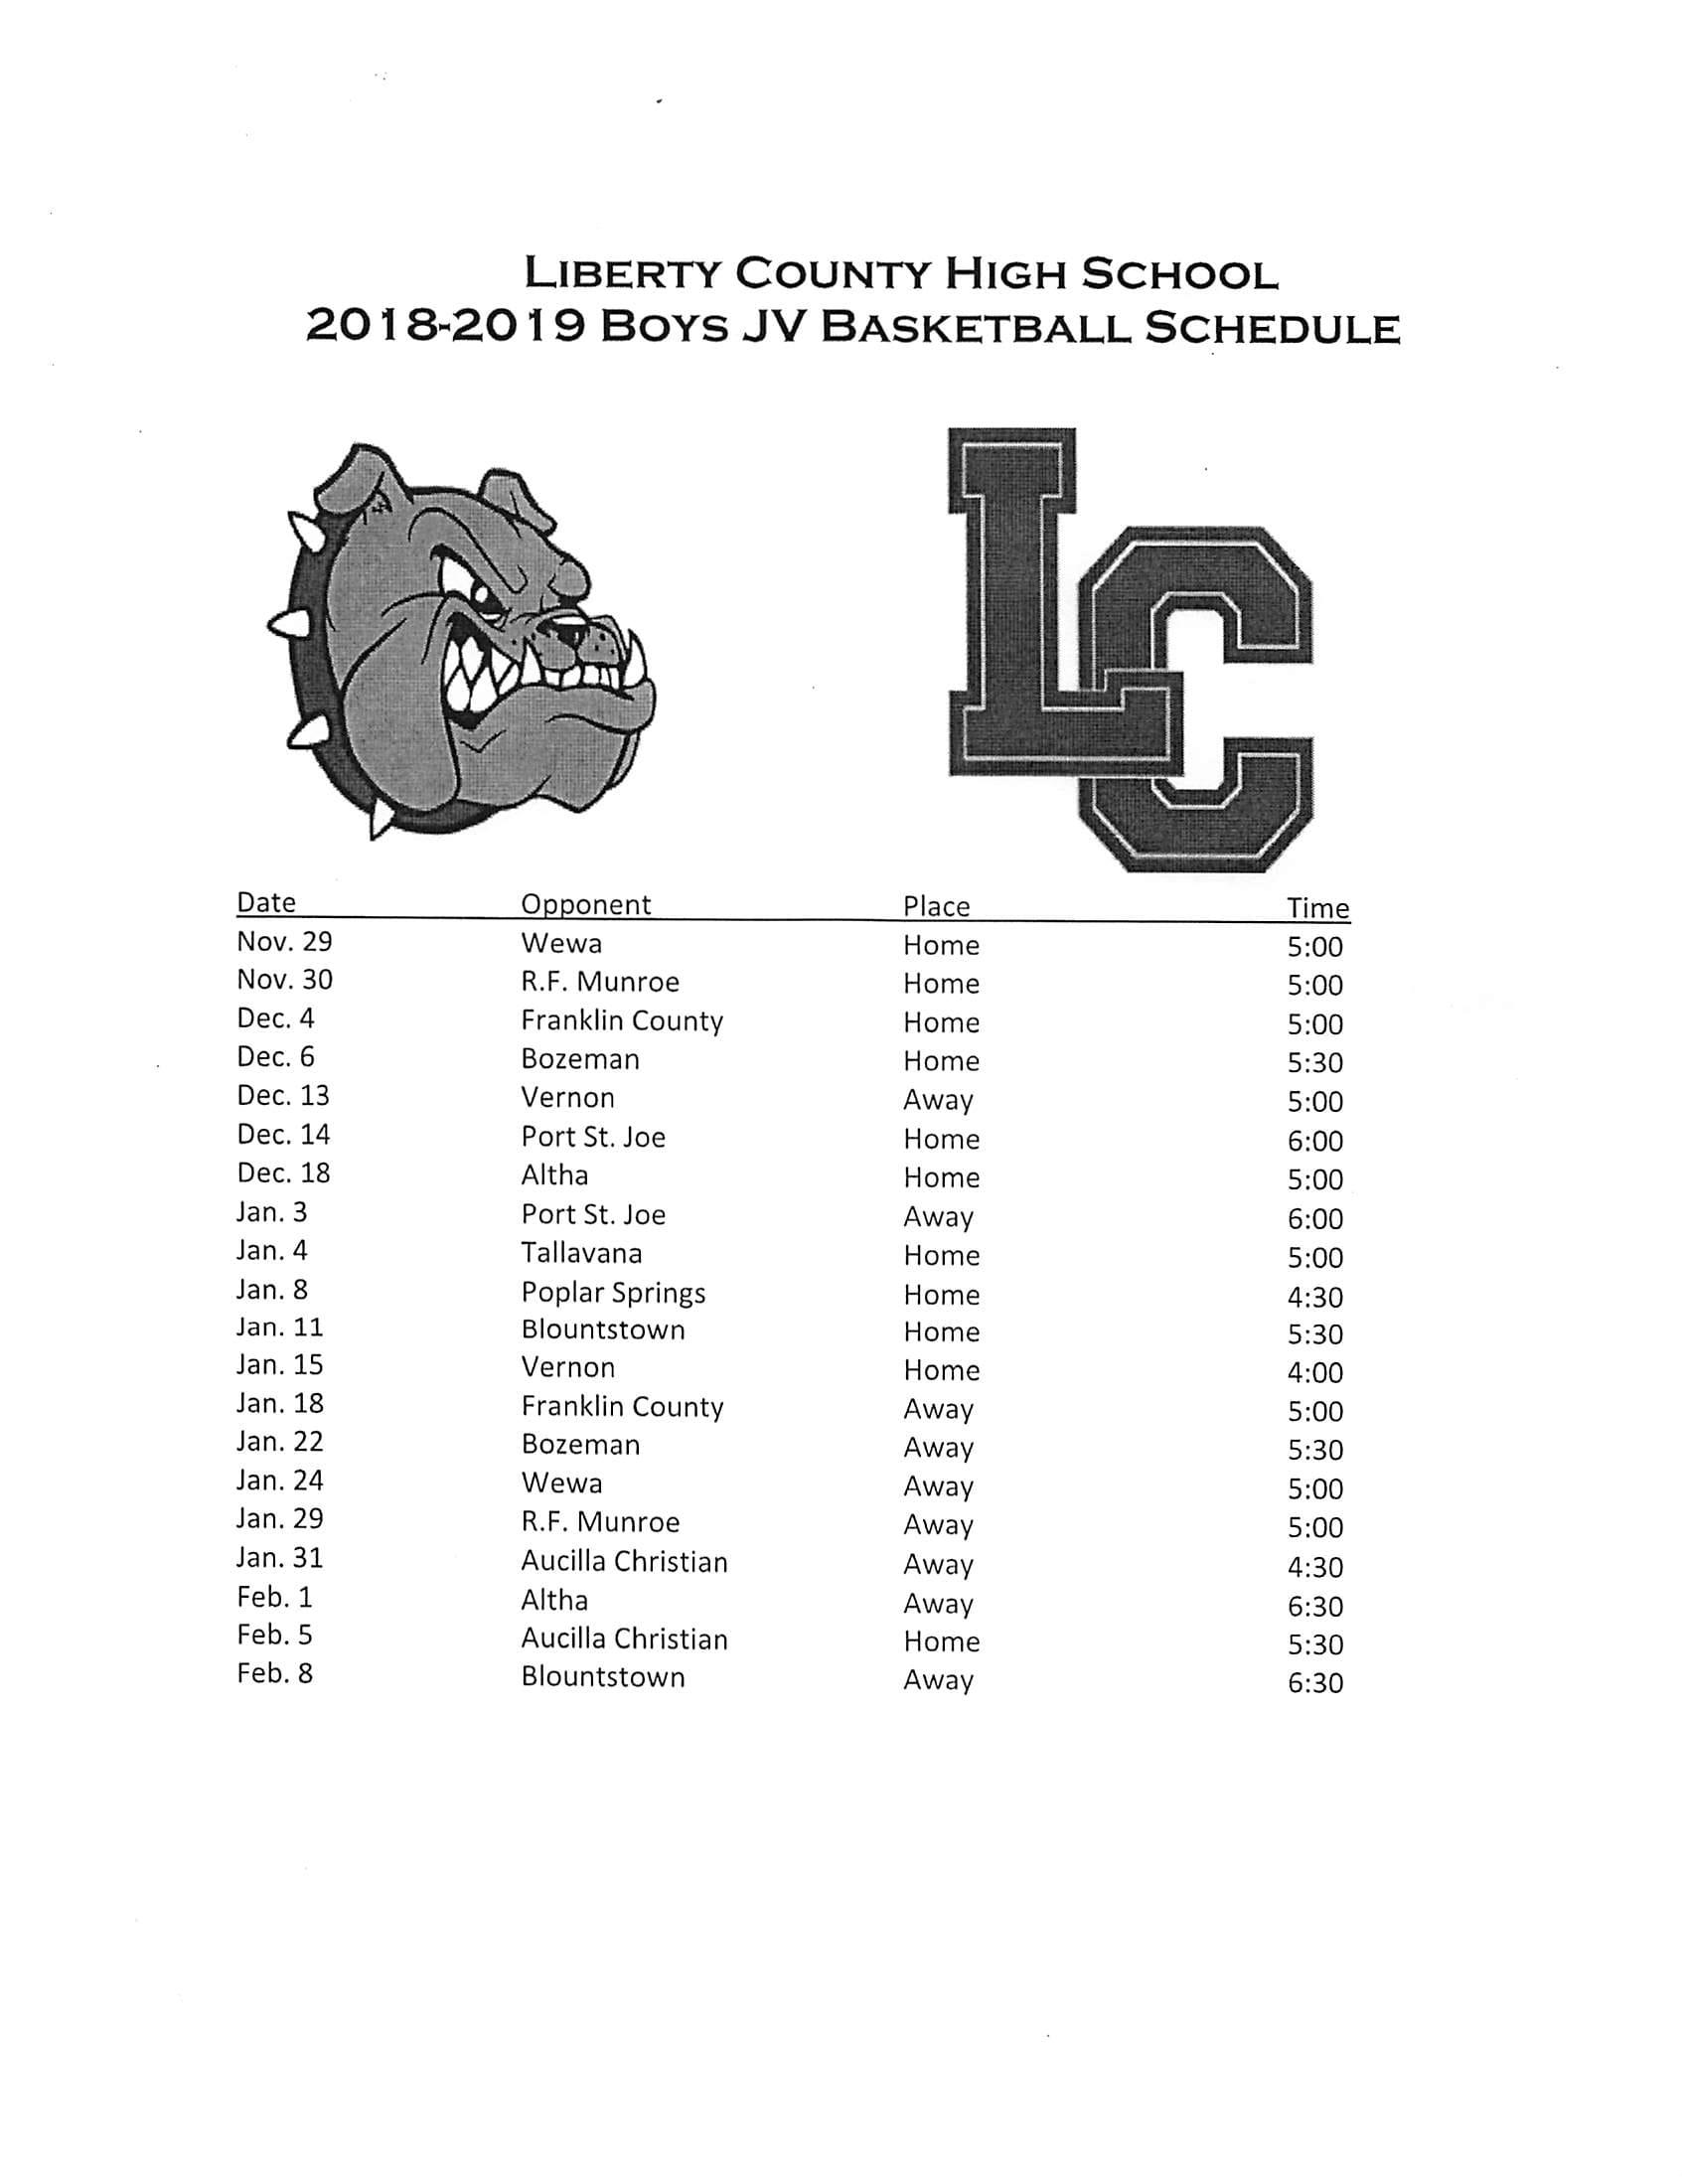 2018-2019 Boys JV Basketball Schedule